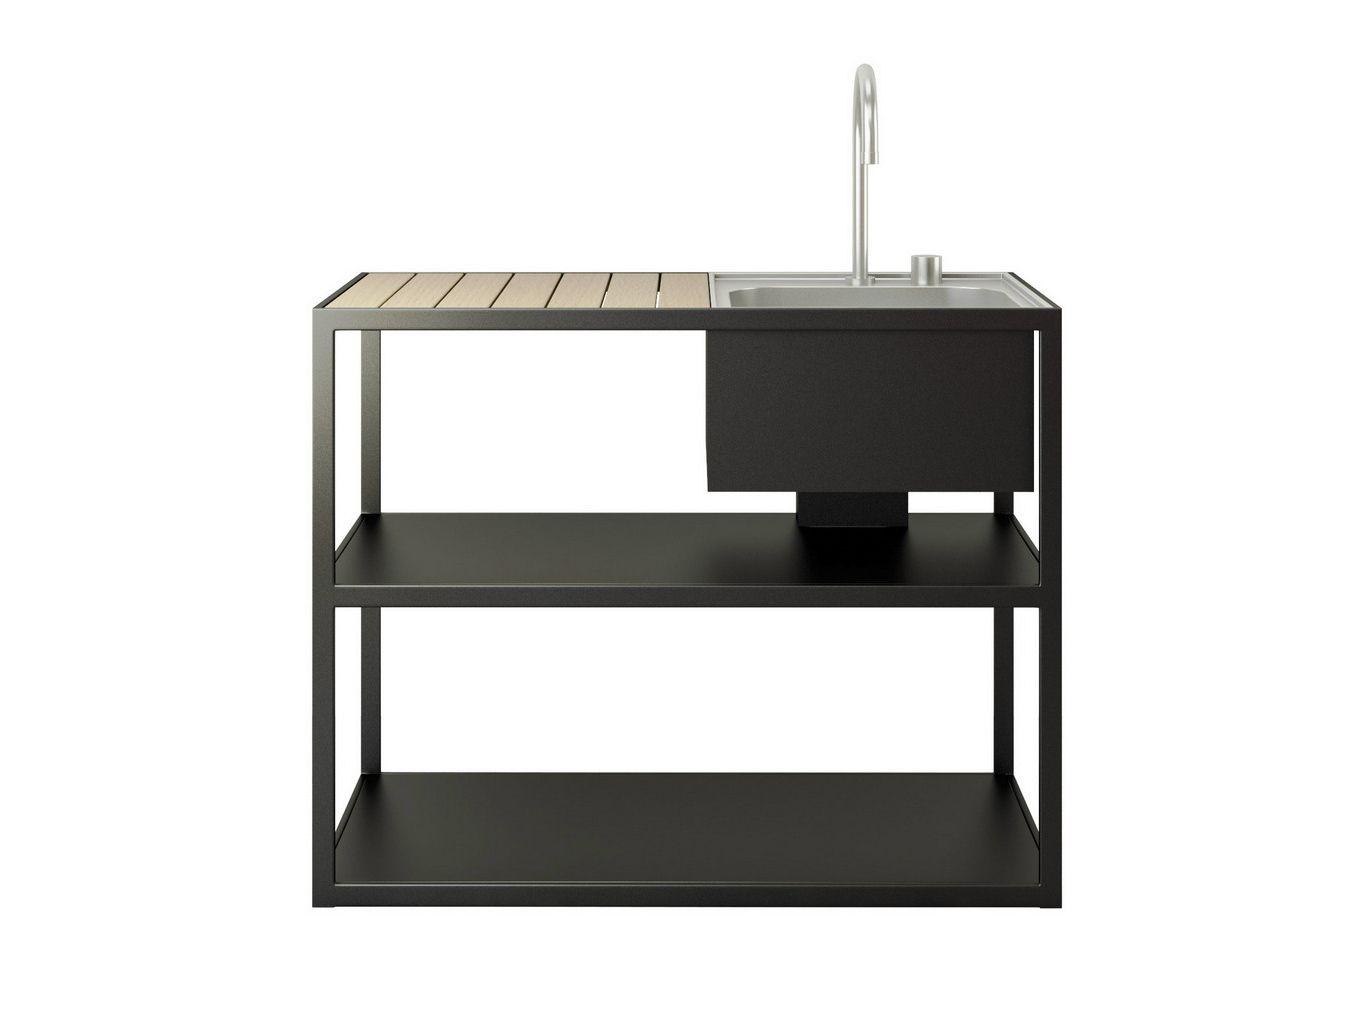 garden cucina da esterno by r shults design brda broberg. Black Bedroom Furniture Sets. Home Design Ideas